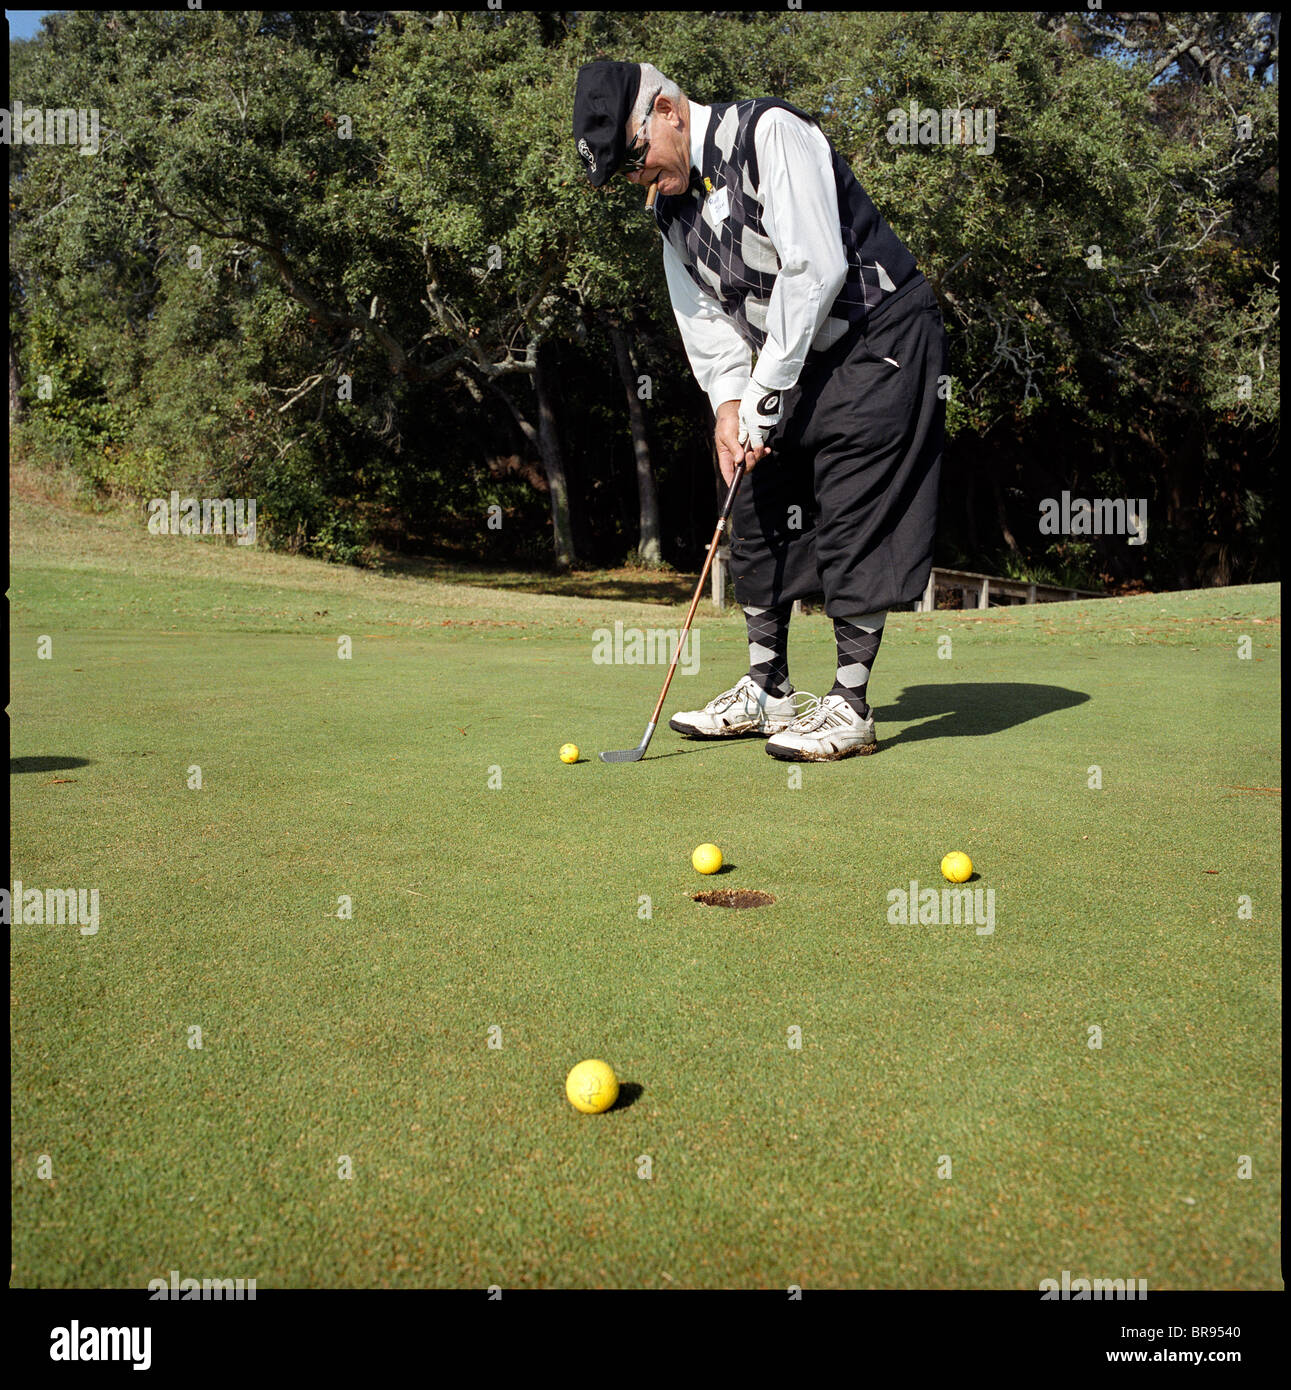 d6894e4ad3e Golf Plus Fours Stock Photos   Golf Plus Fours Stock Images - Alamy